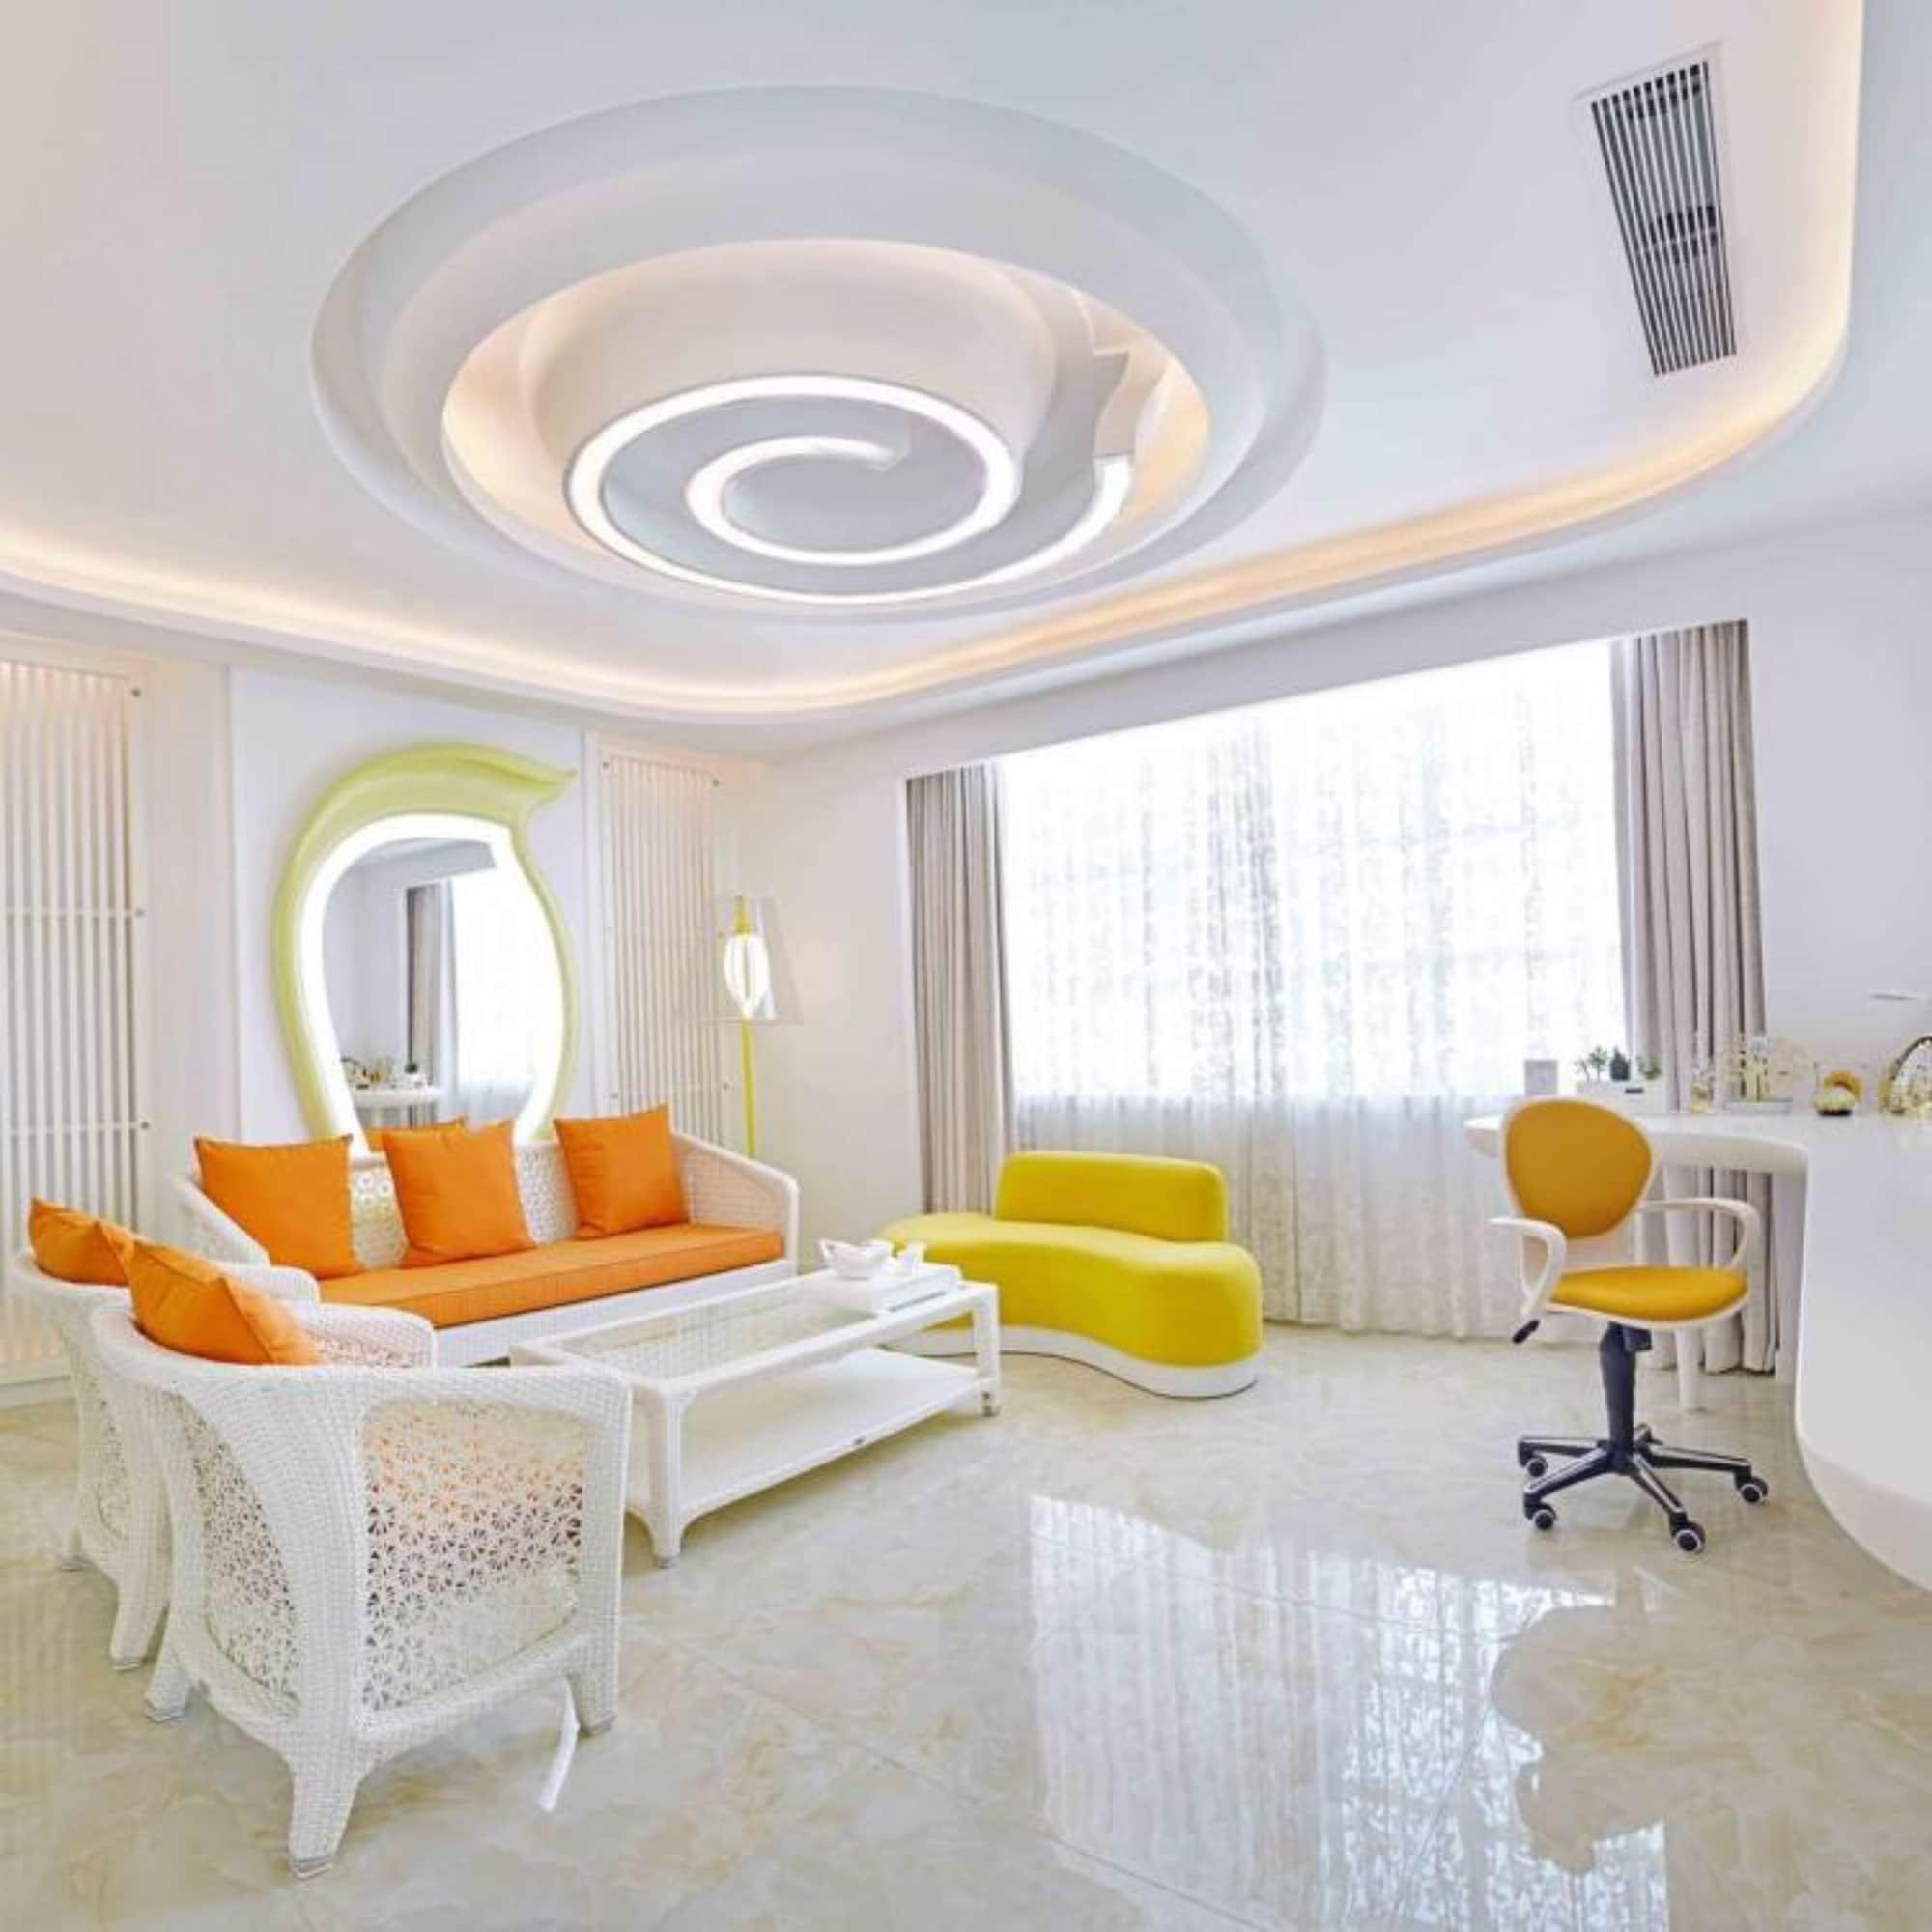 Floloving Hotel, Guangzhou